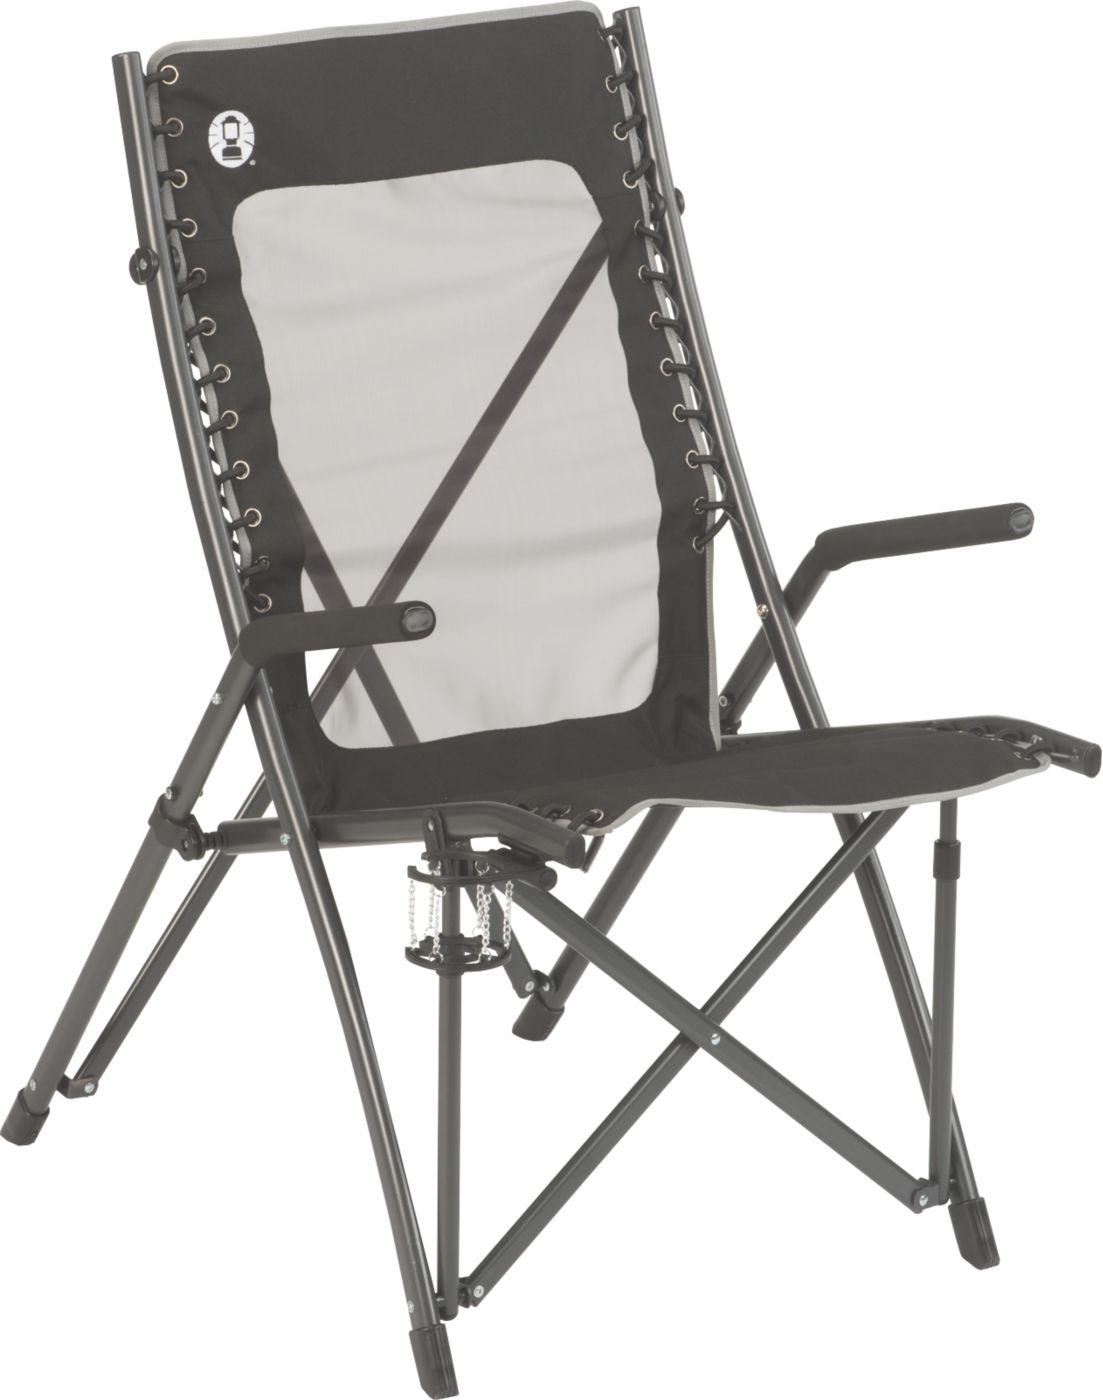 Genial Comfortsmart™ Suspension Chair